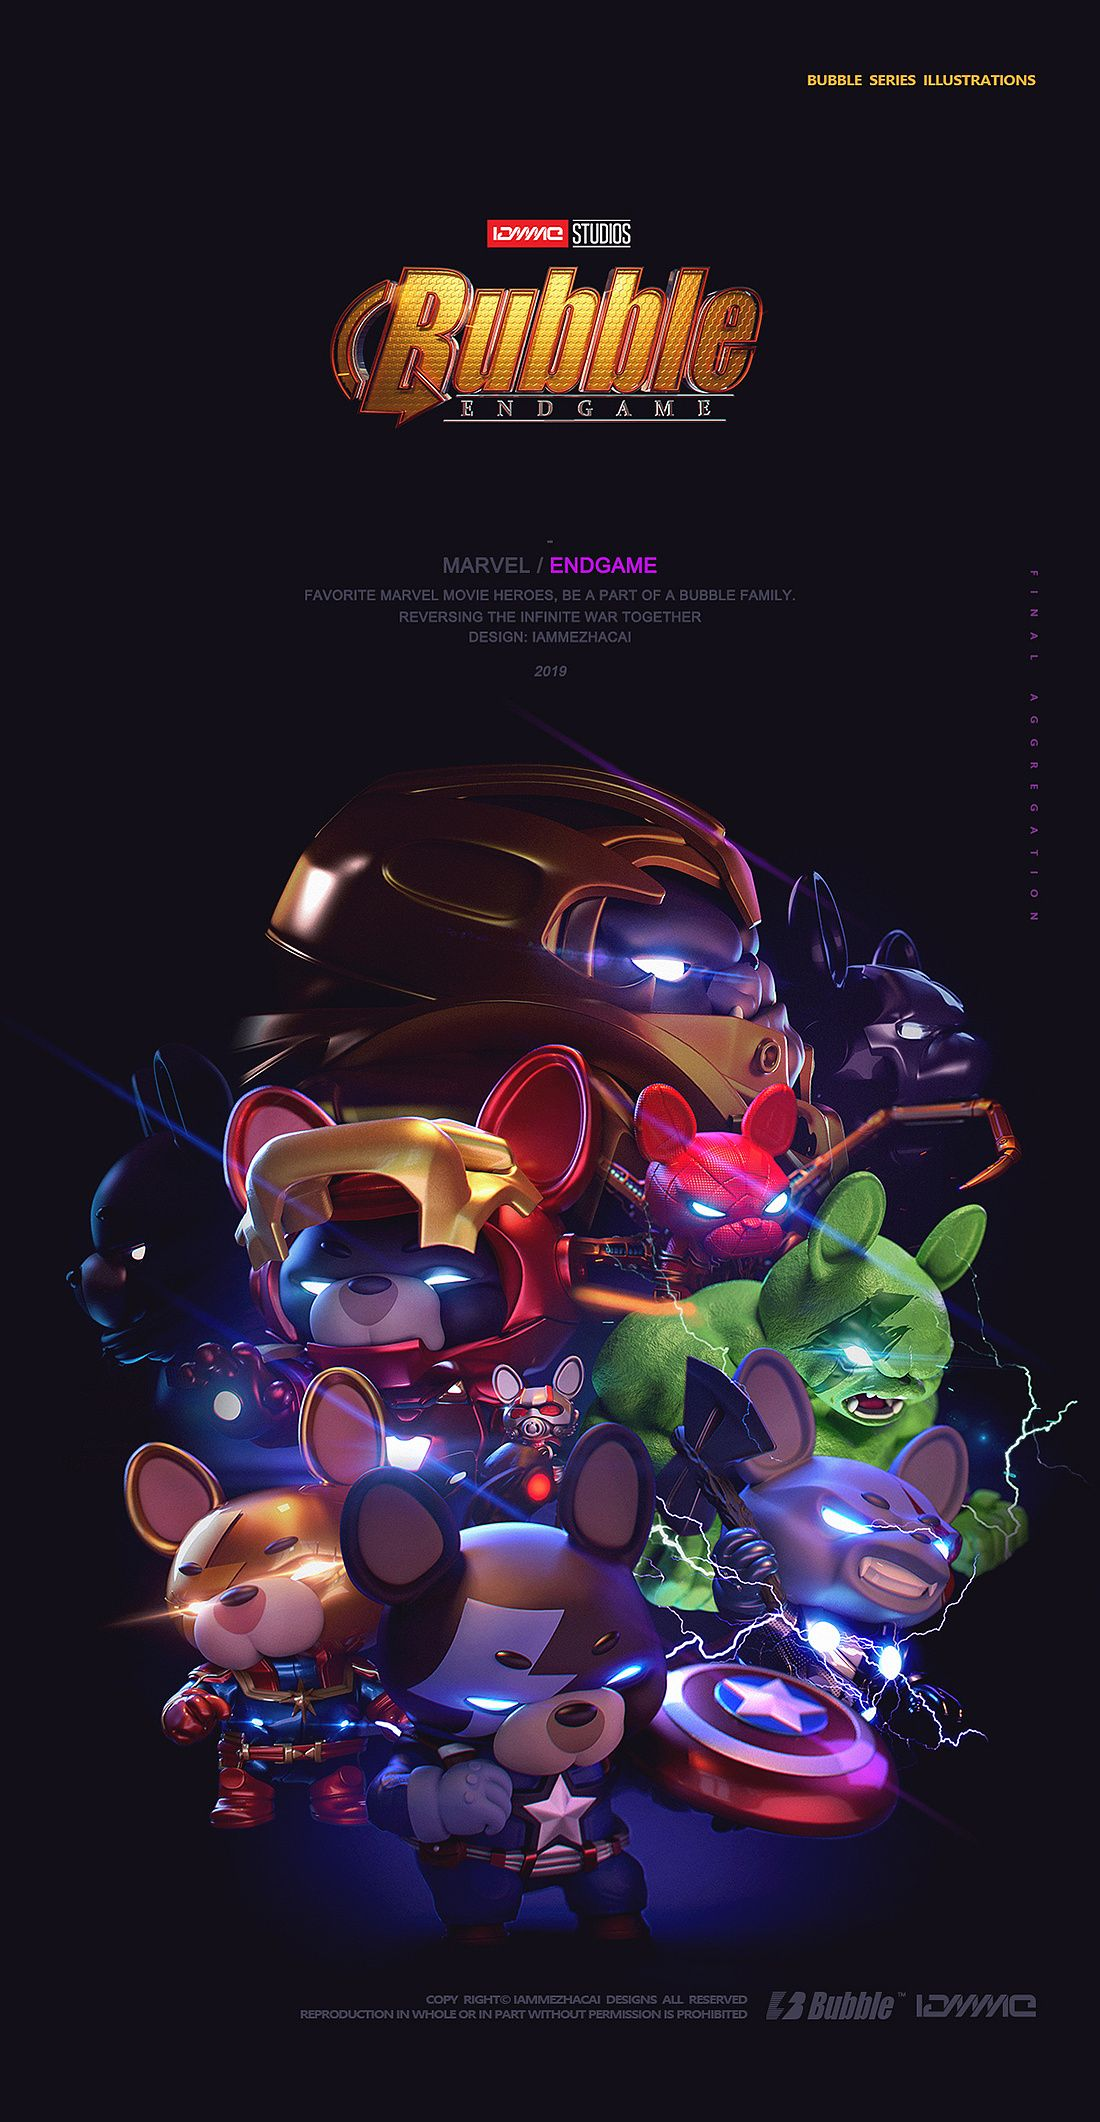 【Avengers Endgame】BUBBLE系列插画平面海报IamMe榨菜 原创作品 站酷